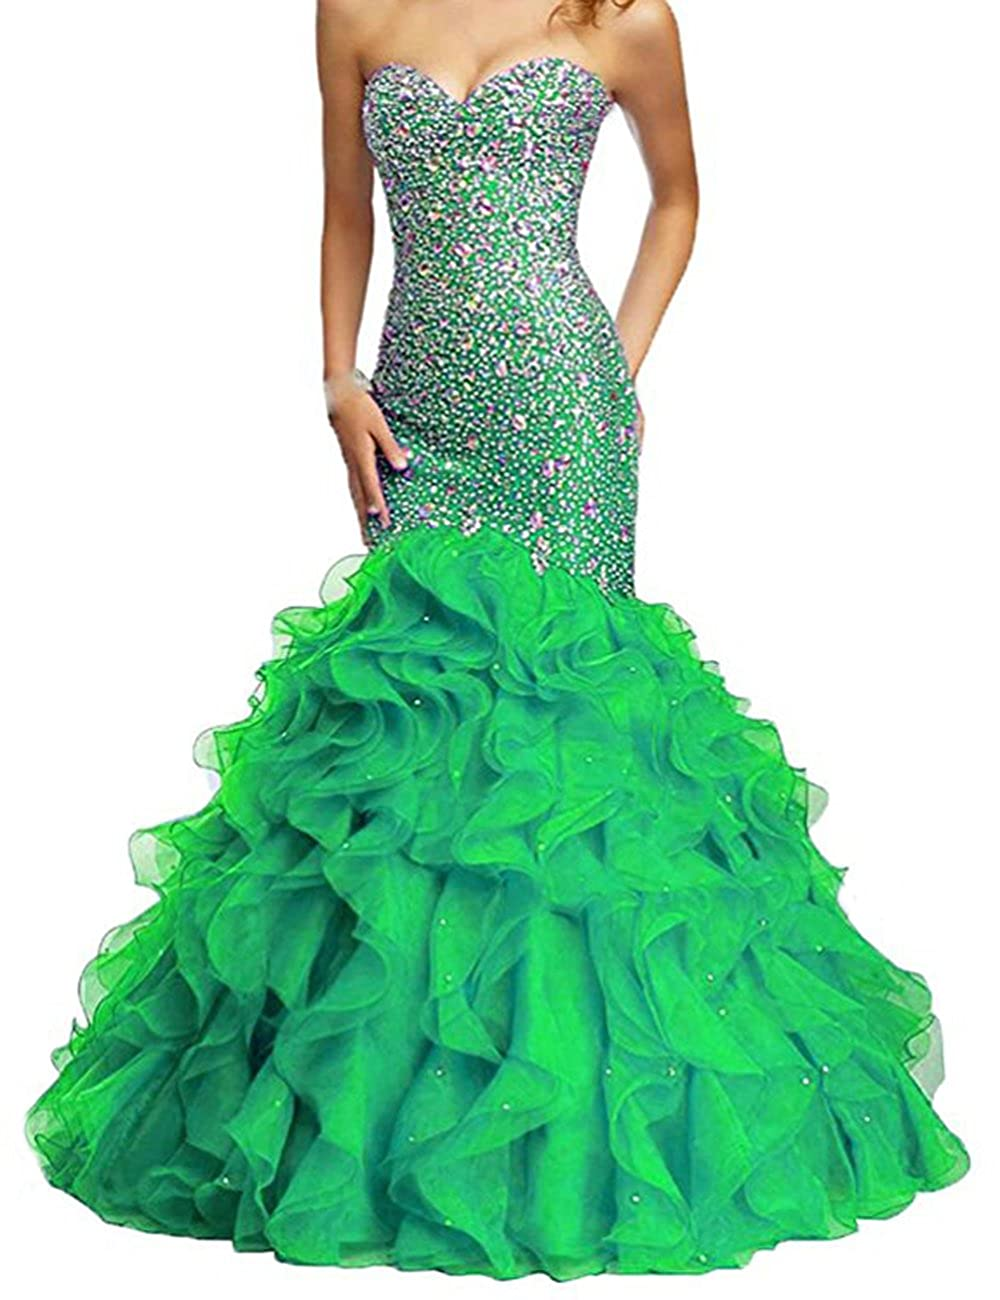 Green Beautydress Luxury Beaded Lace Up Sweetheart Mermaid Prom Dresses for Women BP116